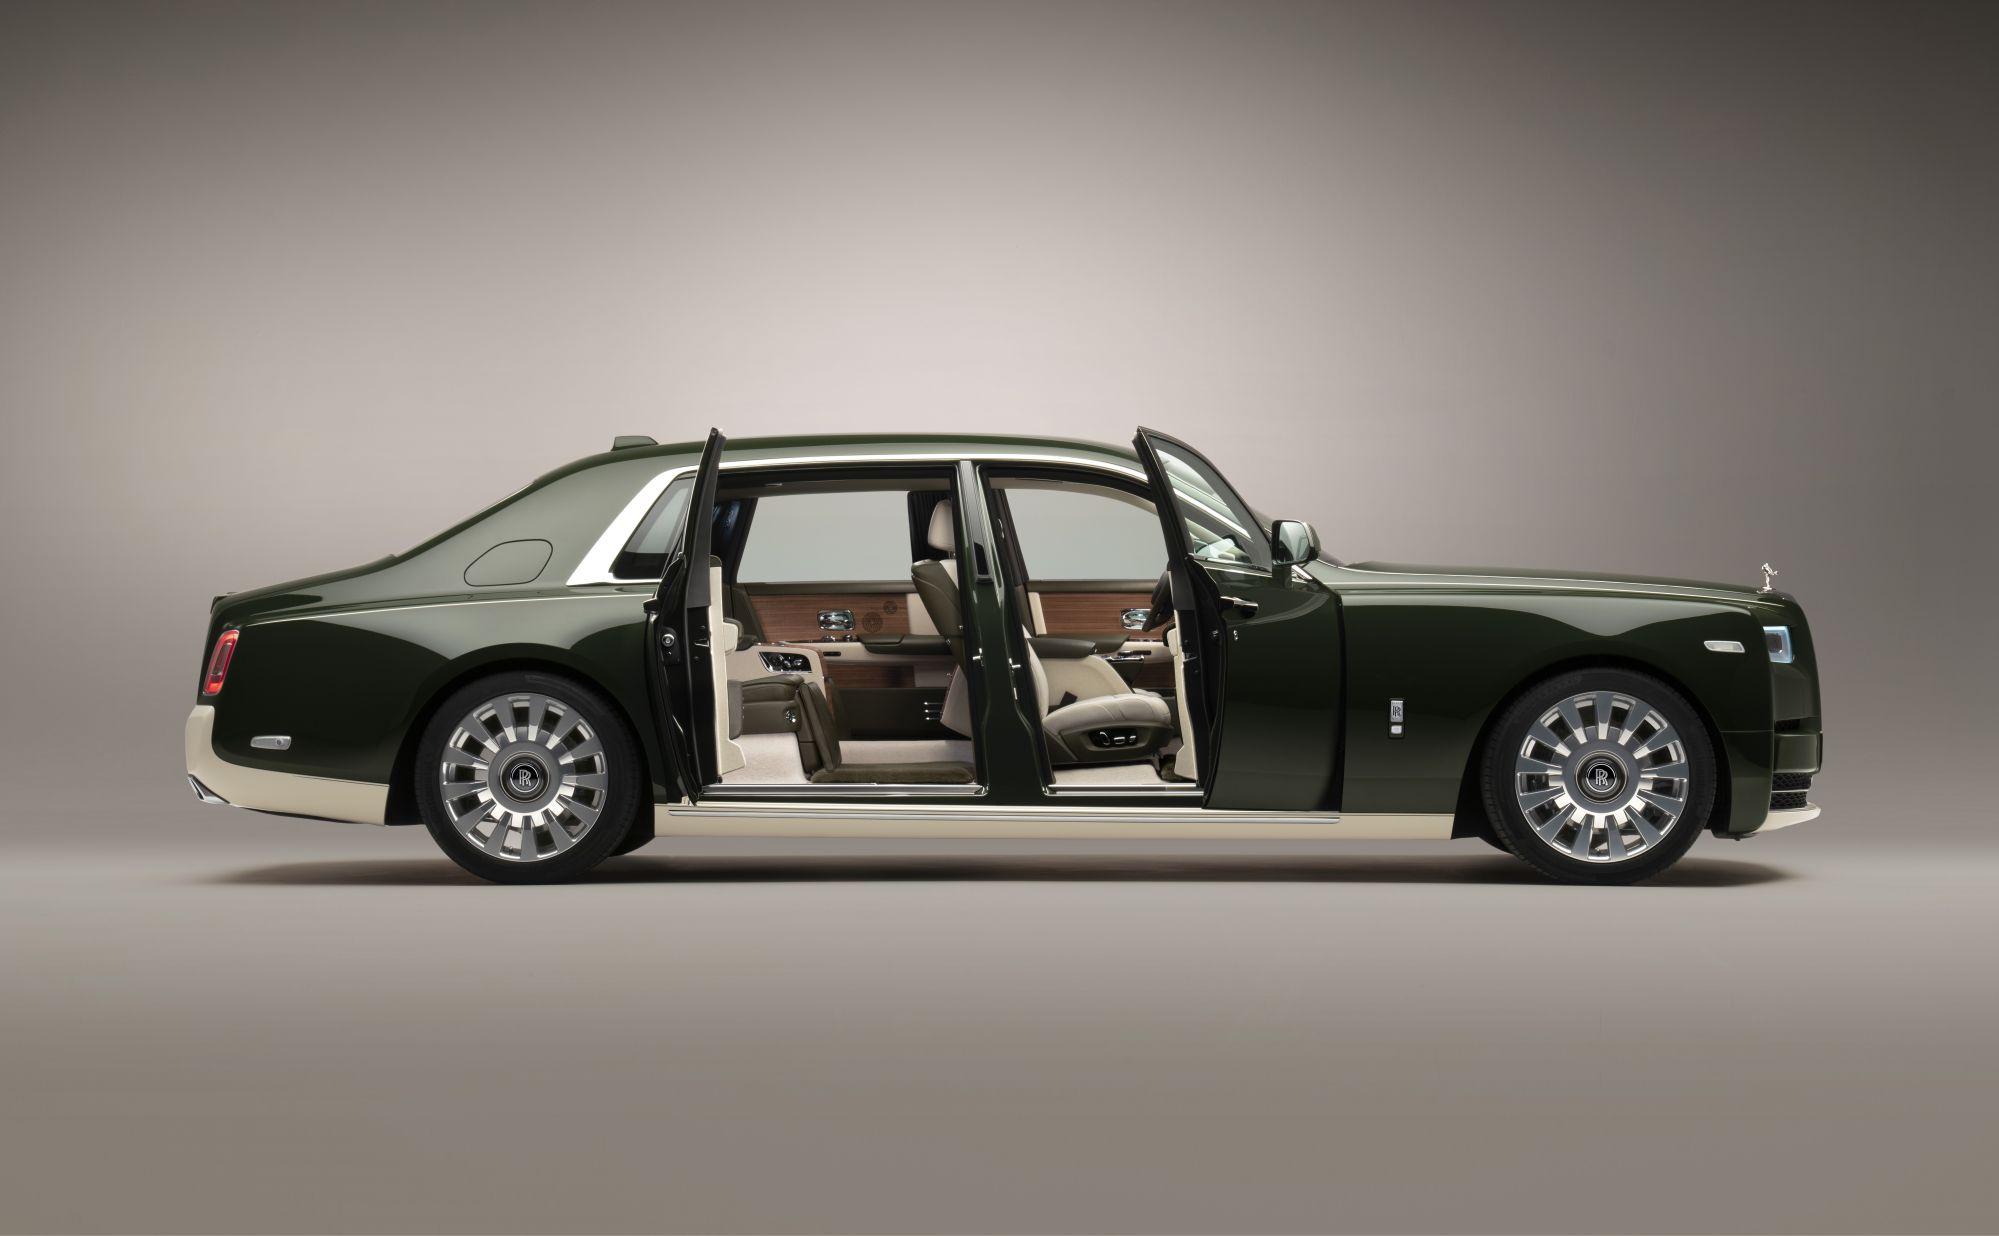 Hermès x Rolls-Royce Collaborate On Bespoke Phantom For Billionaire Yusaku Maezawa